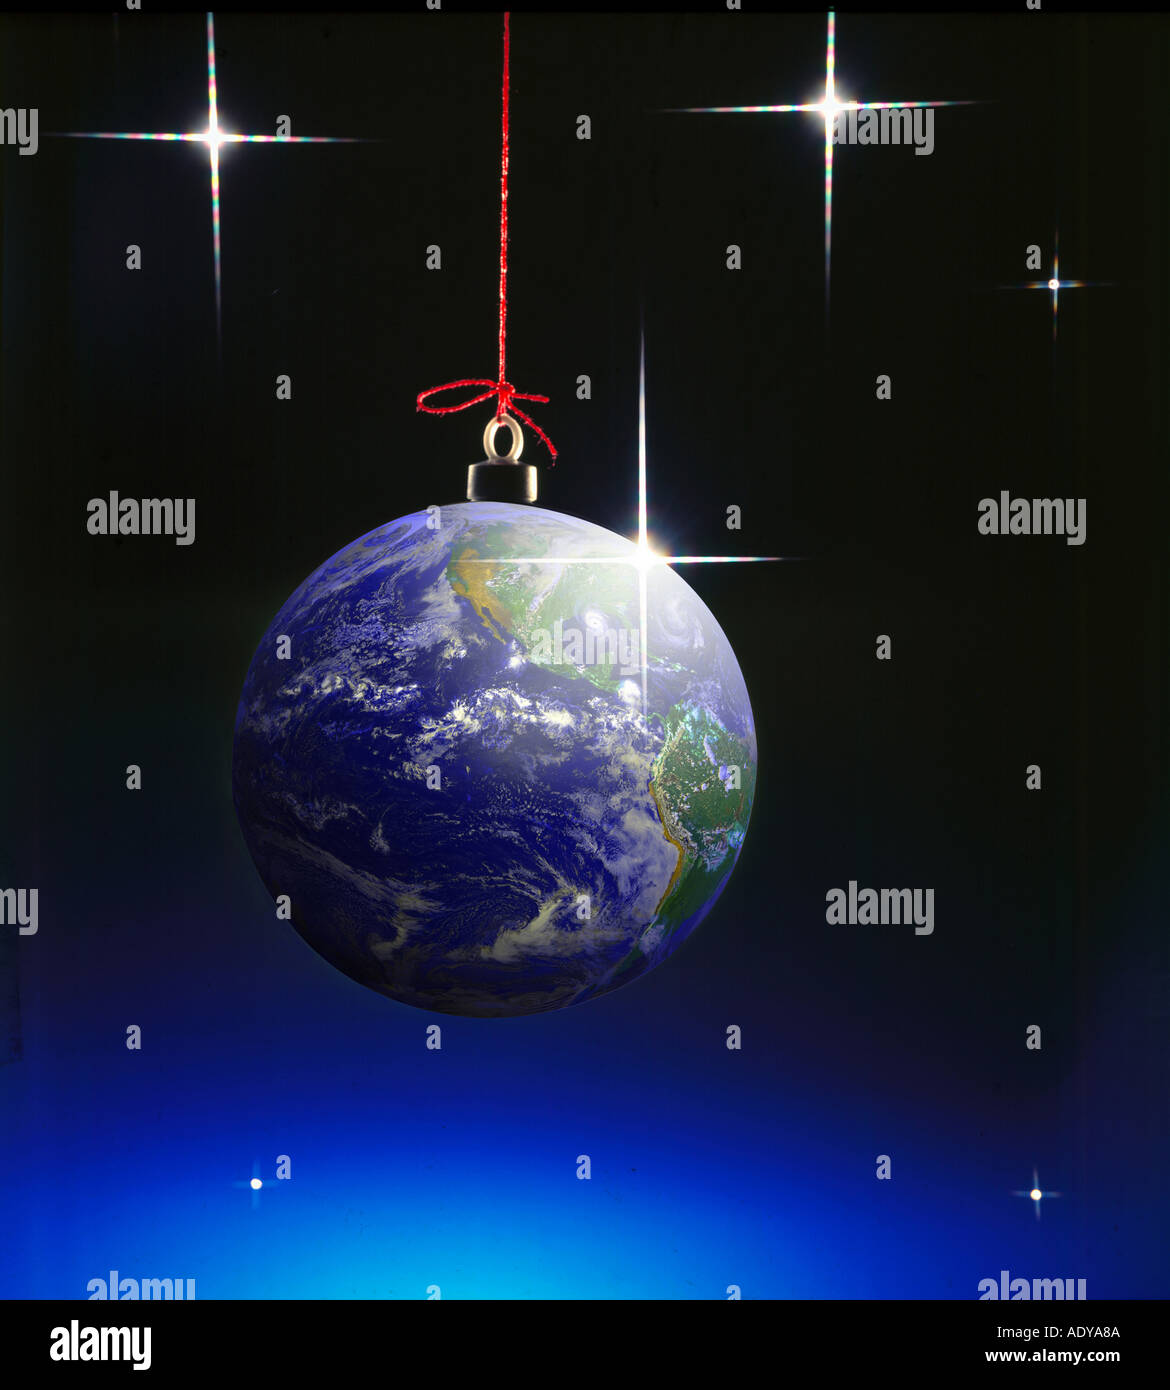 Celebrations I planet as christmas ball x mas hanging firmament star stars universal catholic holiday round void - Stock Image